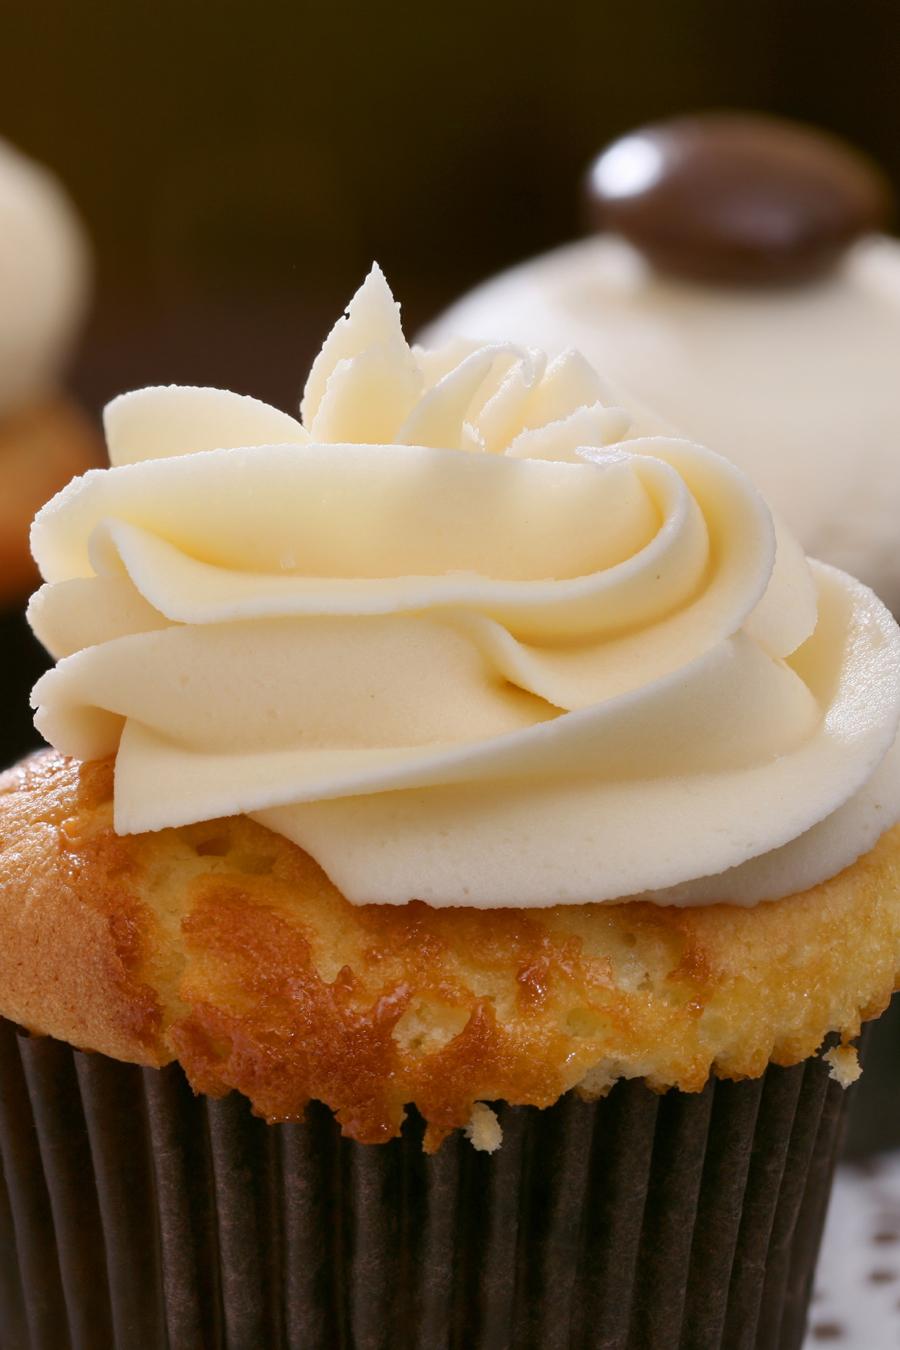 bigstock-Gourmet-cupcakes-84330023_edited.jpg